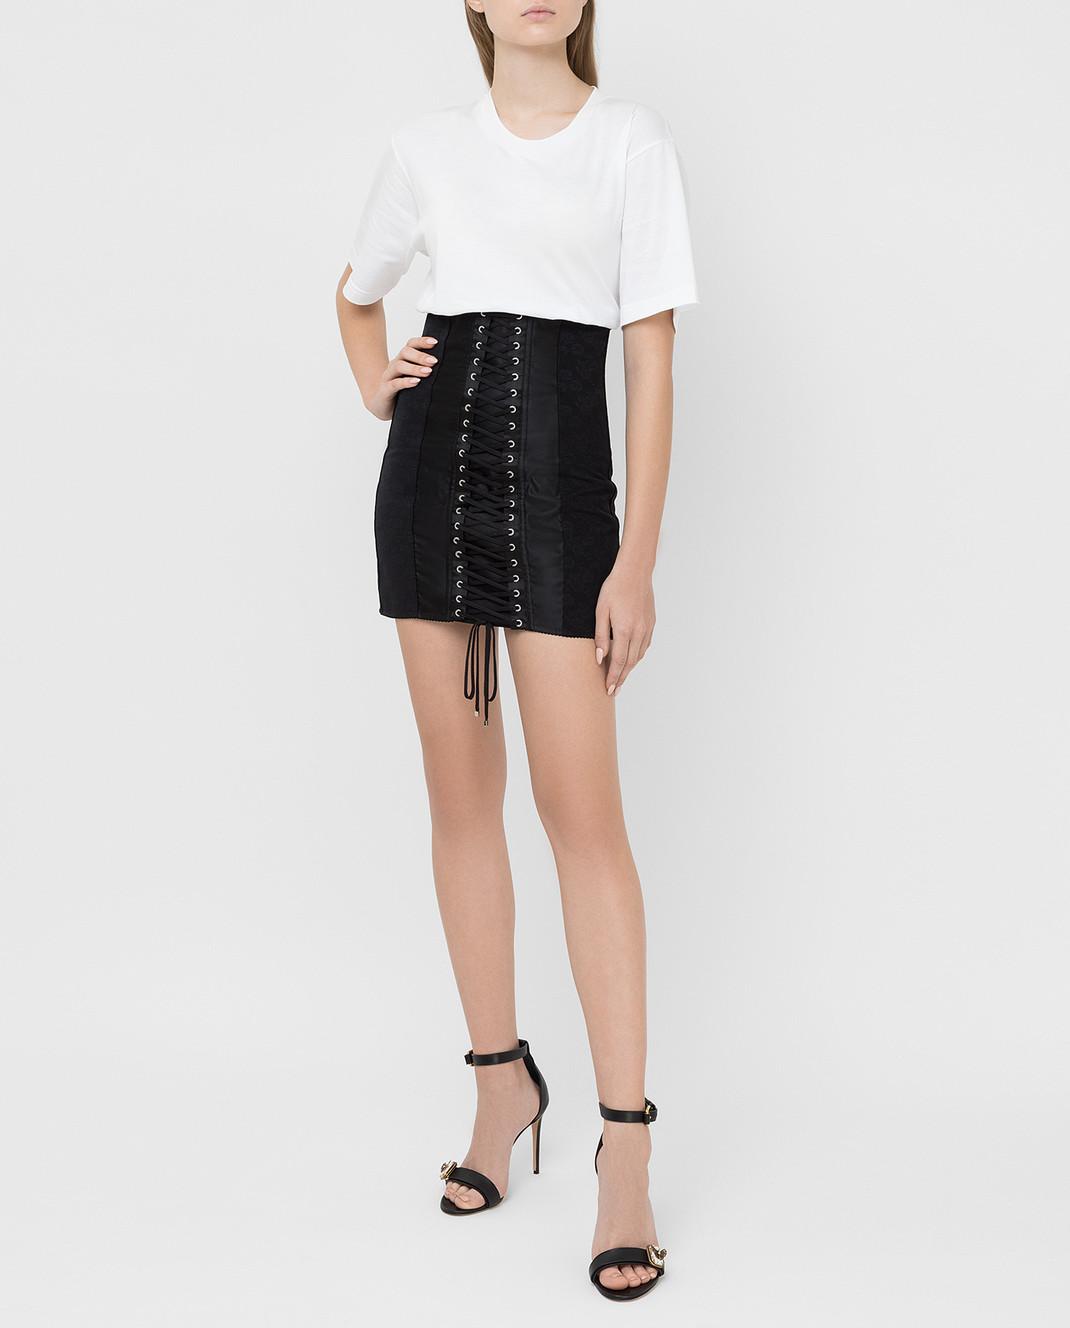 Dolce&Gabbana Черная юбка изображение 2